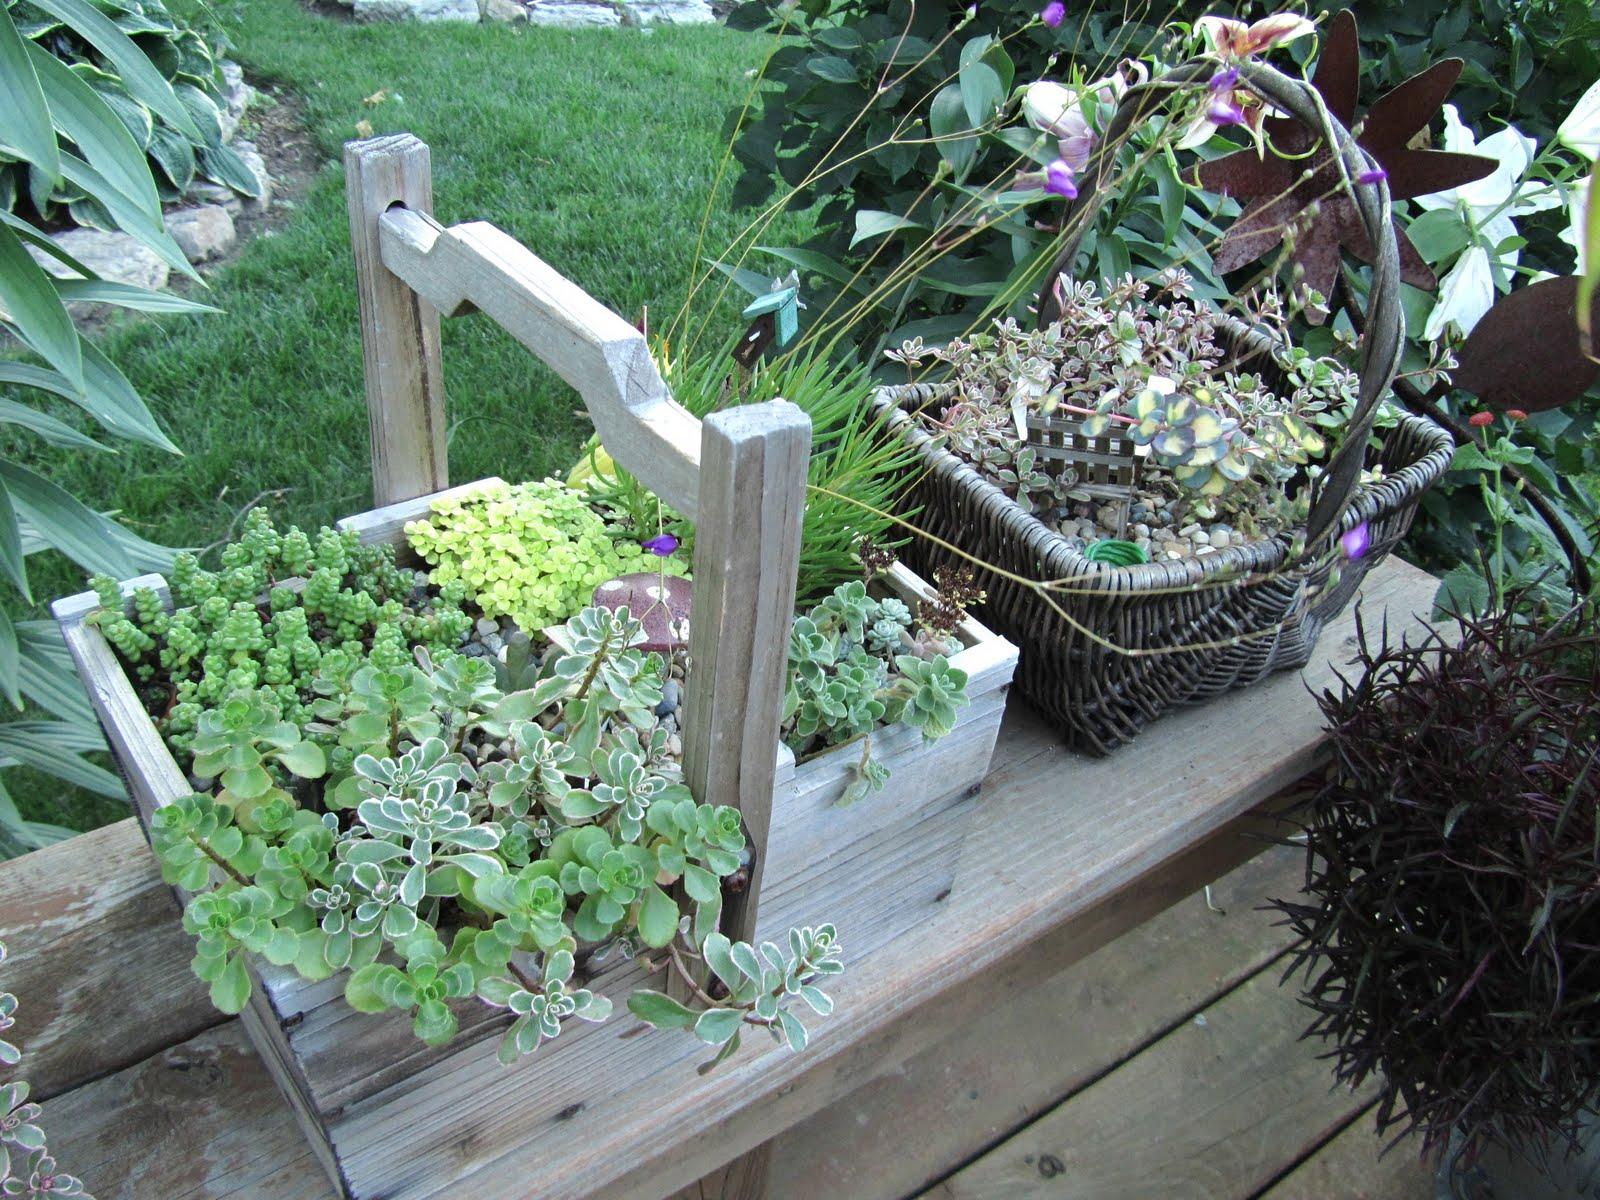 Cheesehead Gardening: Miniature Container Gardens / Fairy